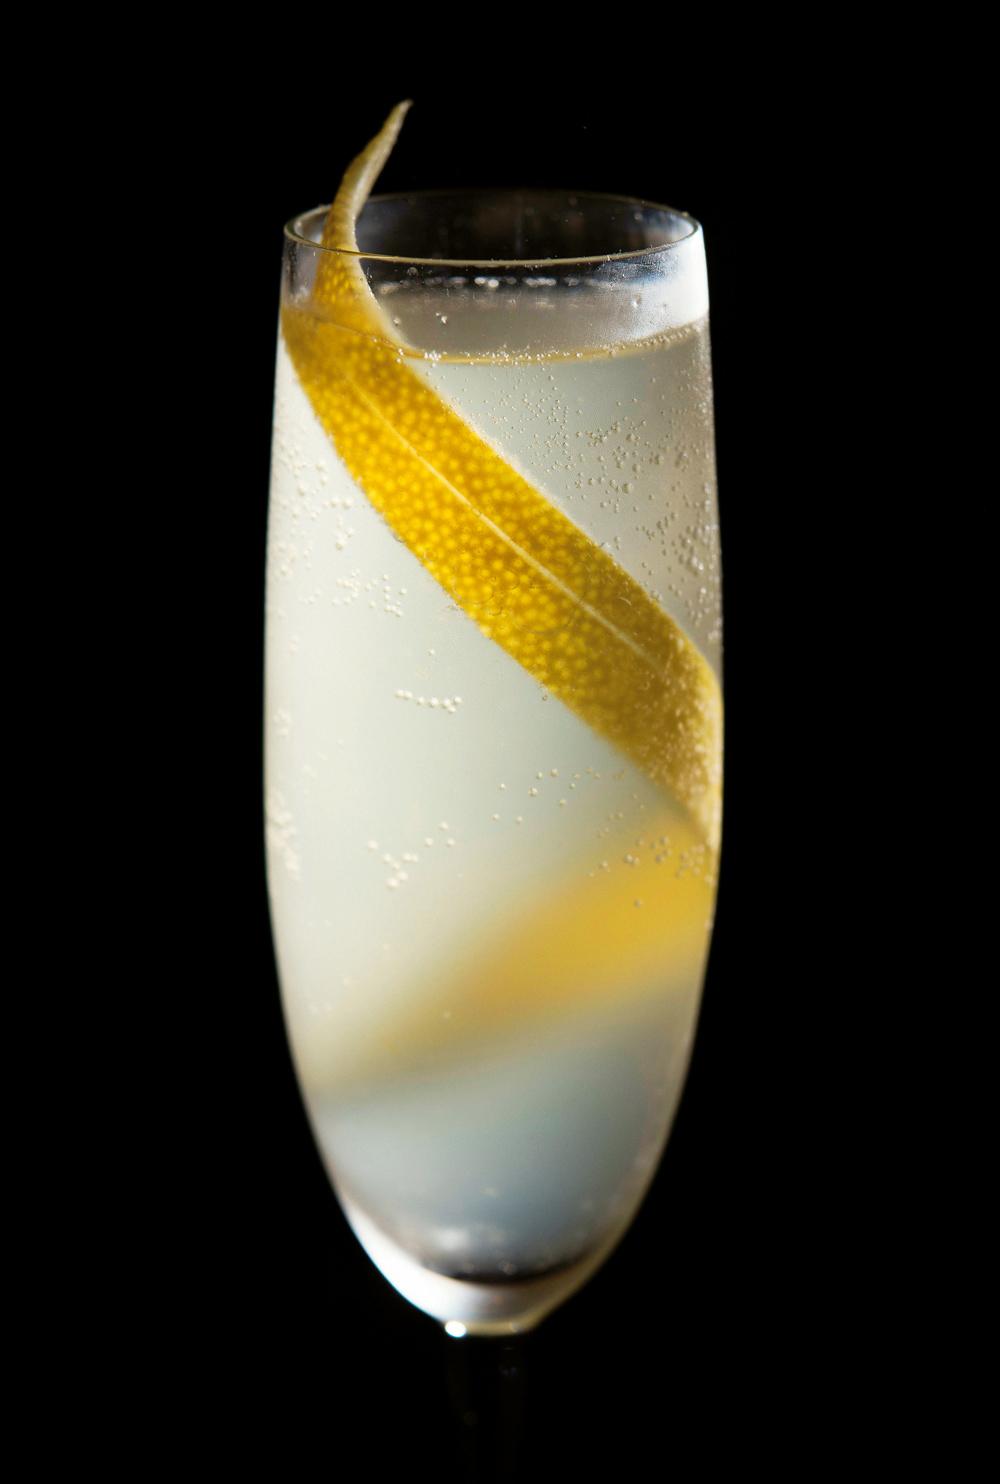 The French 75. Photo Source: Australian Bartender.